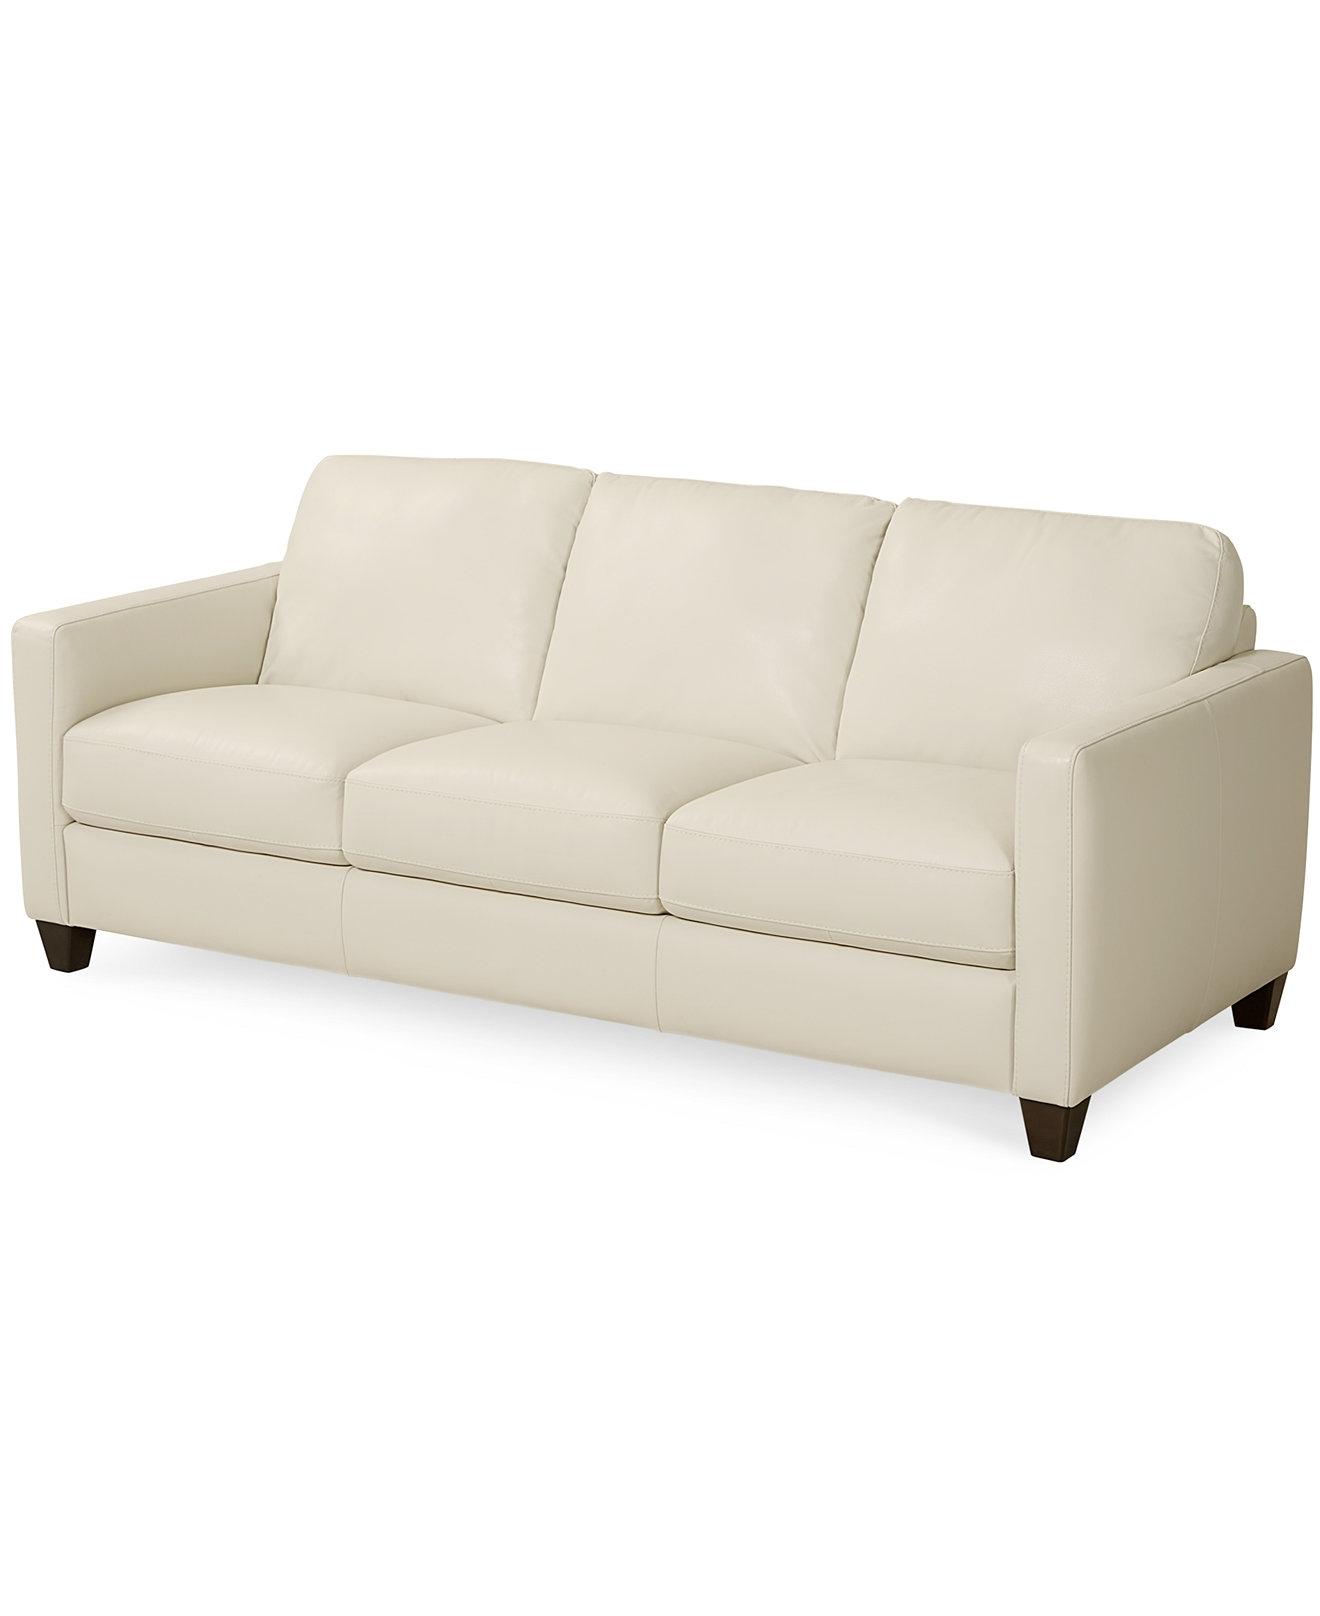 Fashionable Macys Leather Sofa – Mforum Within Macys Sofas (View 4 of 15)